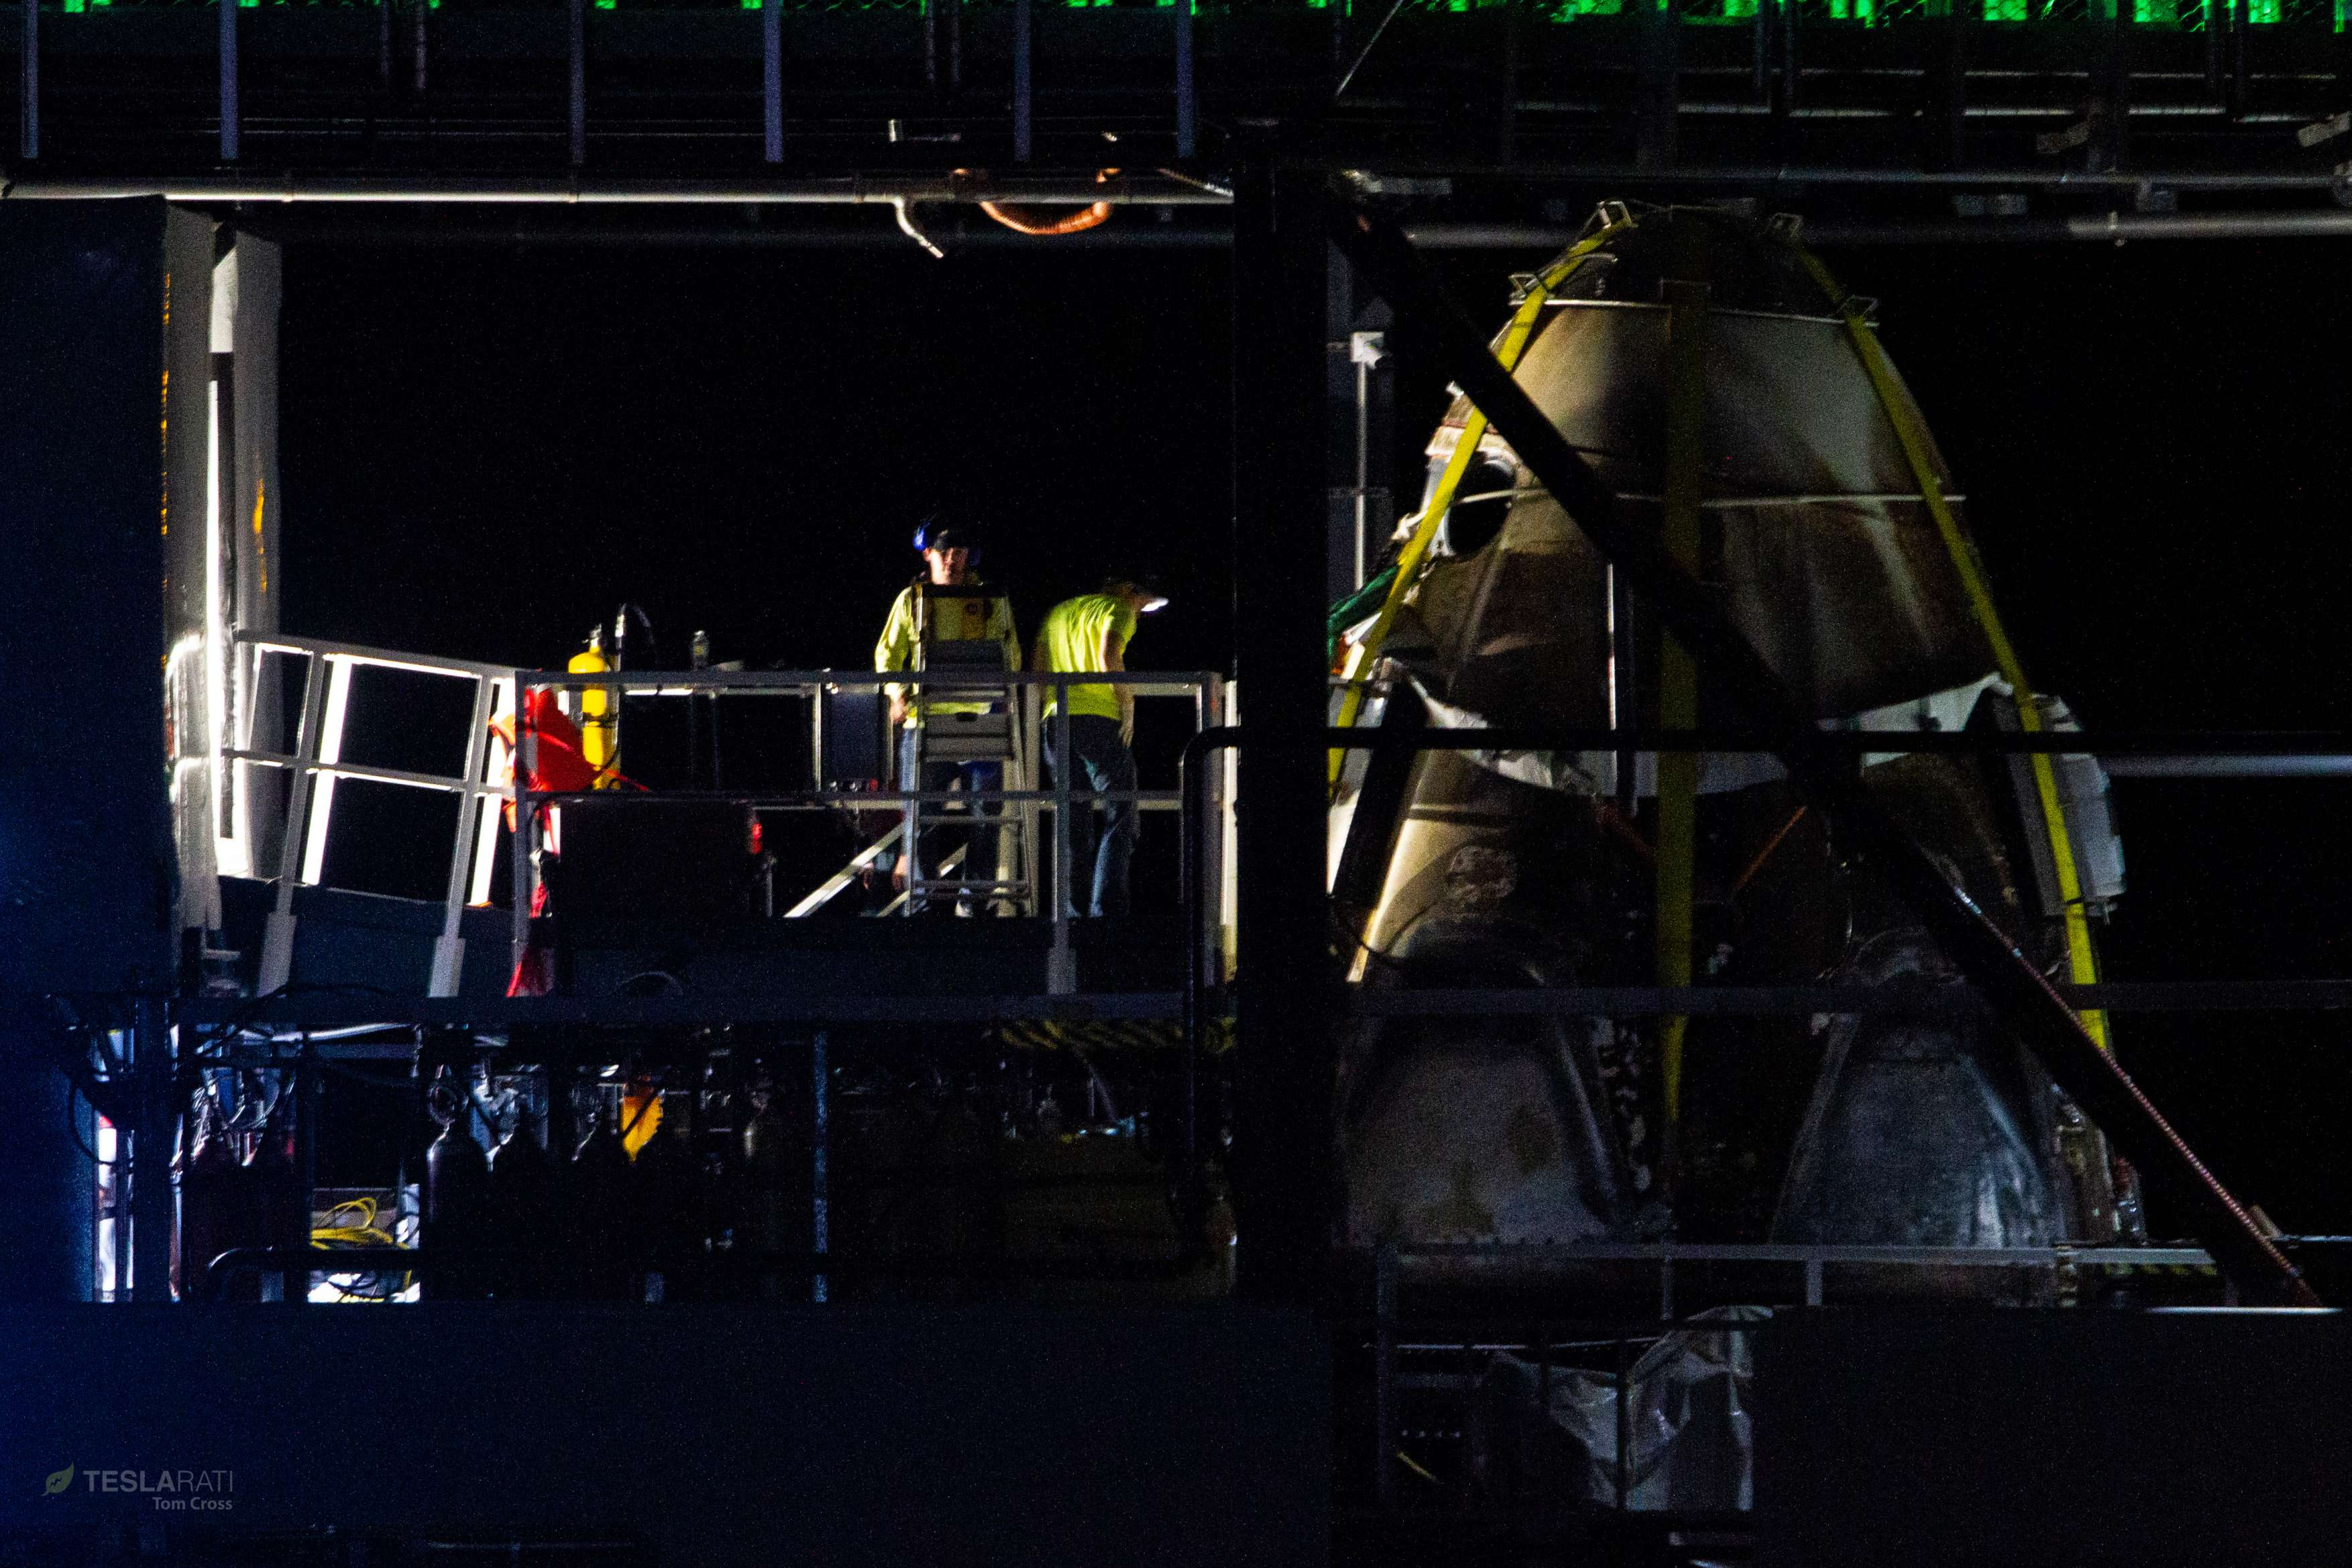 Crew Dragon DM-1 capsule port return 031019 (Tom Cross) detail 5 (c)